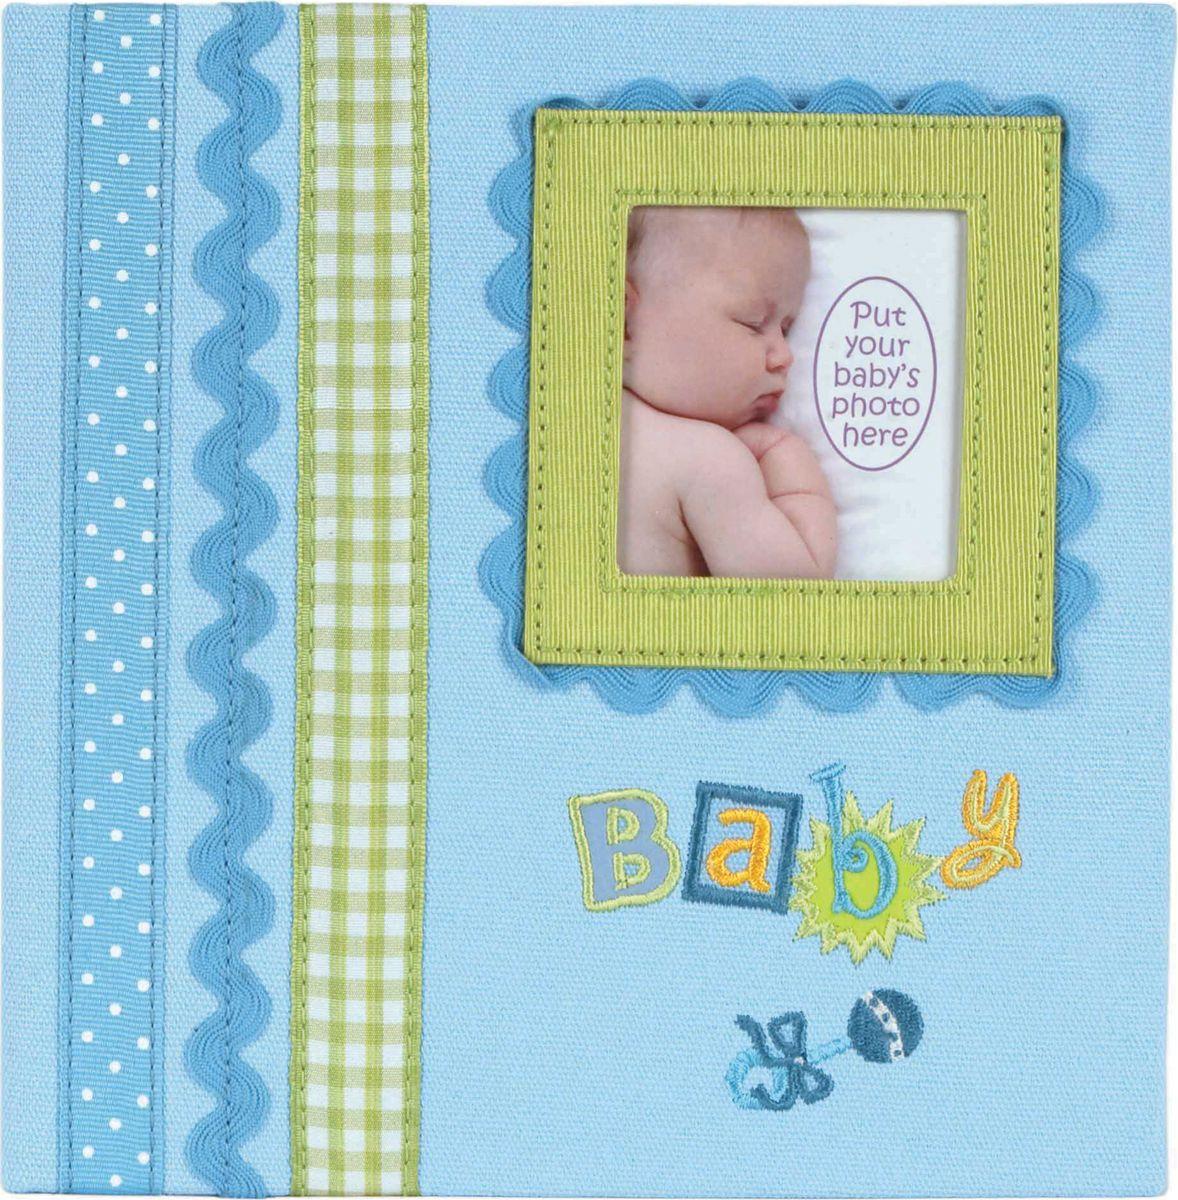 Фотоальбом Innova Baby Memories Blue Memo, 180 фотографий, 10 x 15 смQ4403615MДетский фотоальбом на 180 фотографий размером 10х15.